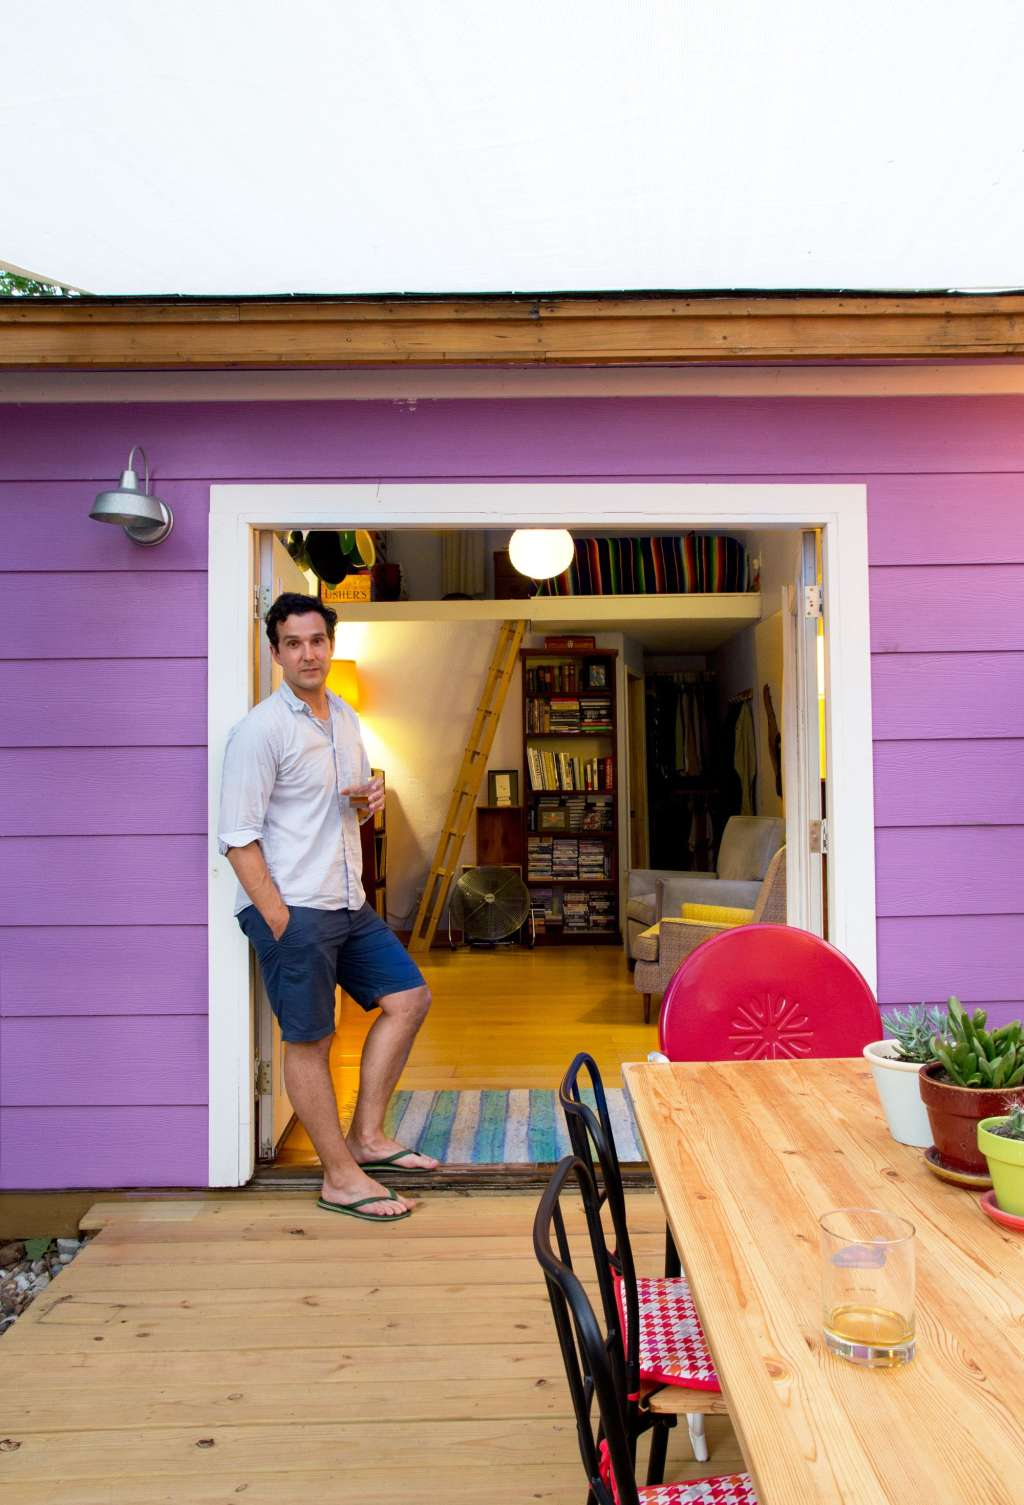 House Tour: A Tiny 250 Square Foot Austin Studio